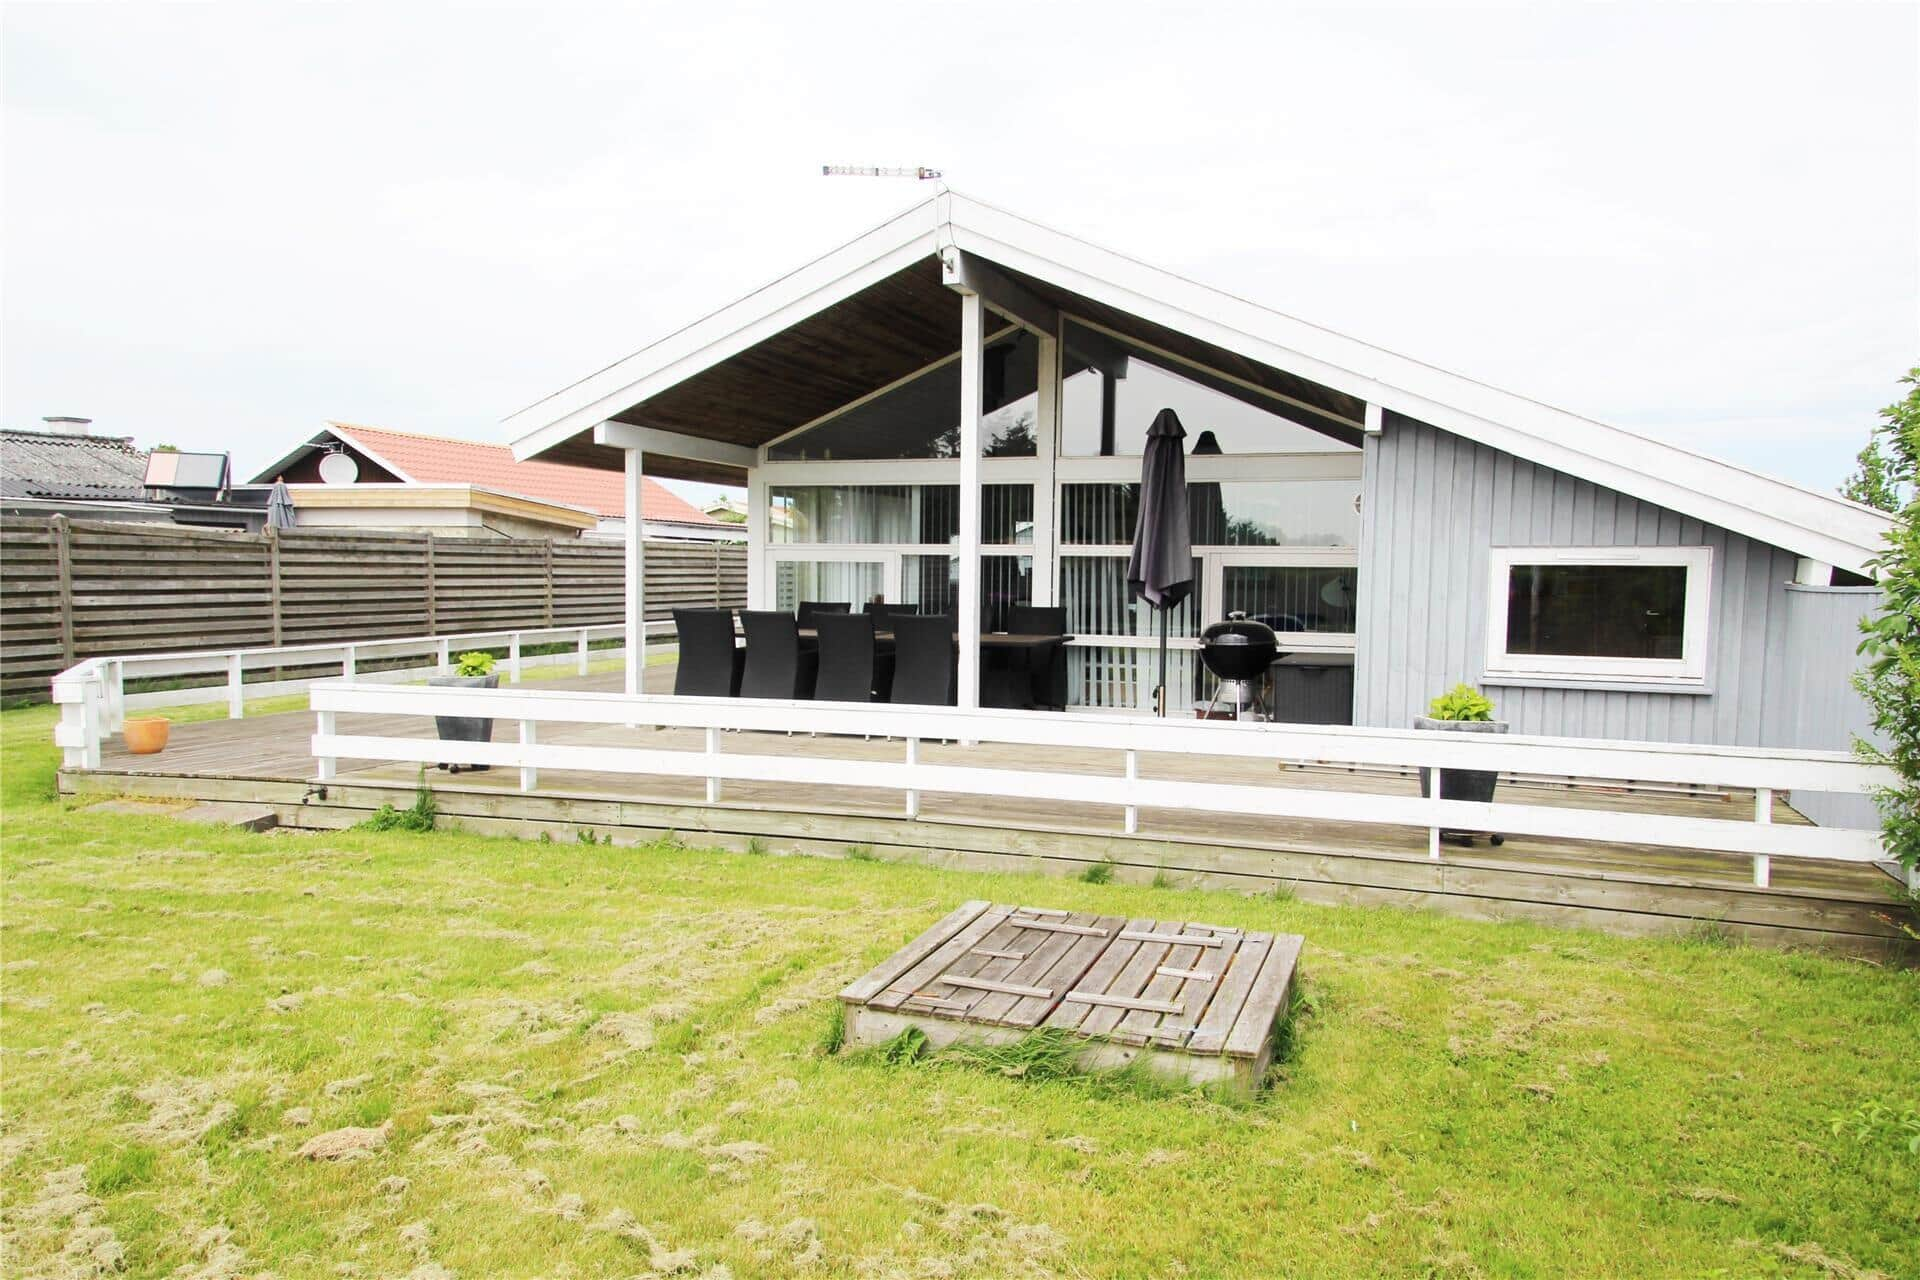 Billede 1-3 Sommerhus M64589, Birkevej 19, DK - 5450 Otterup